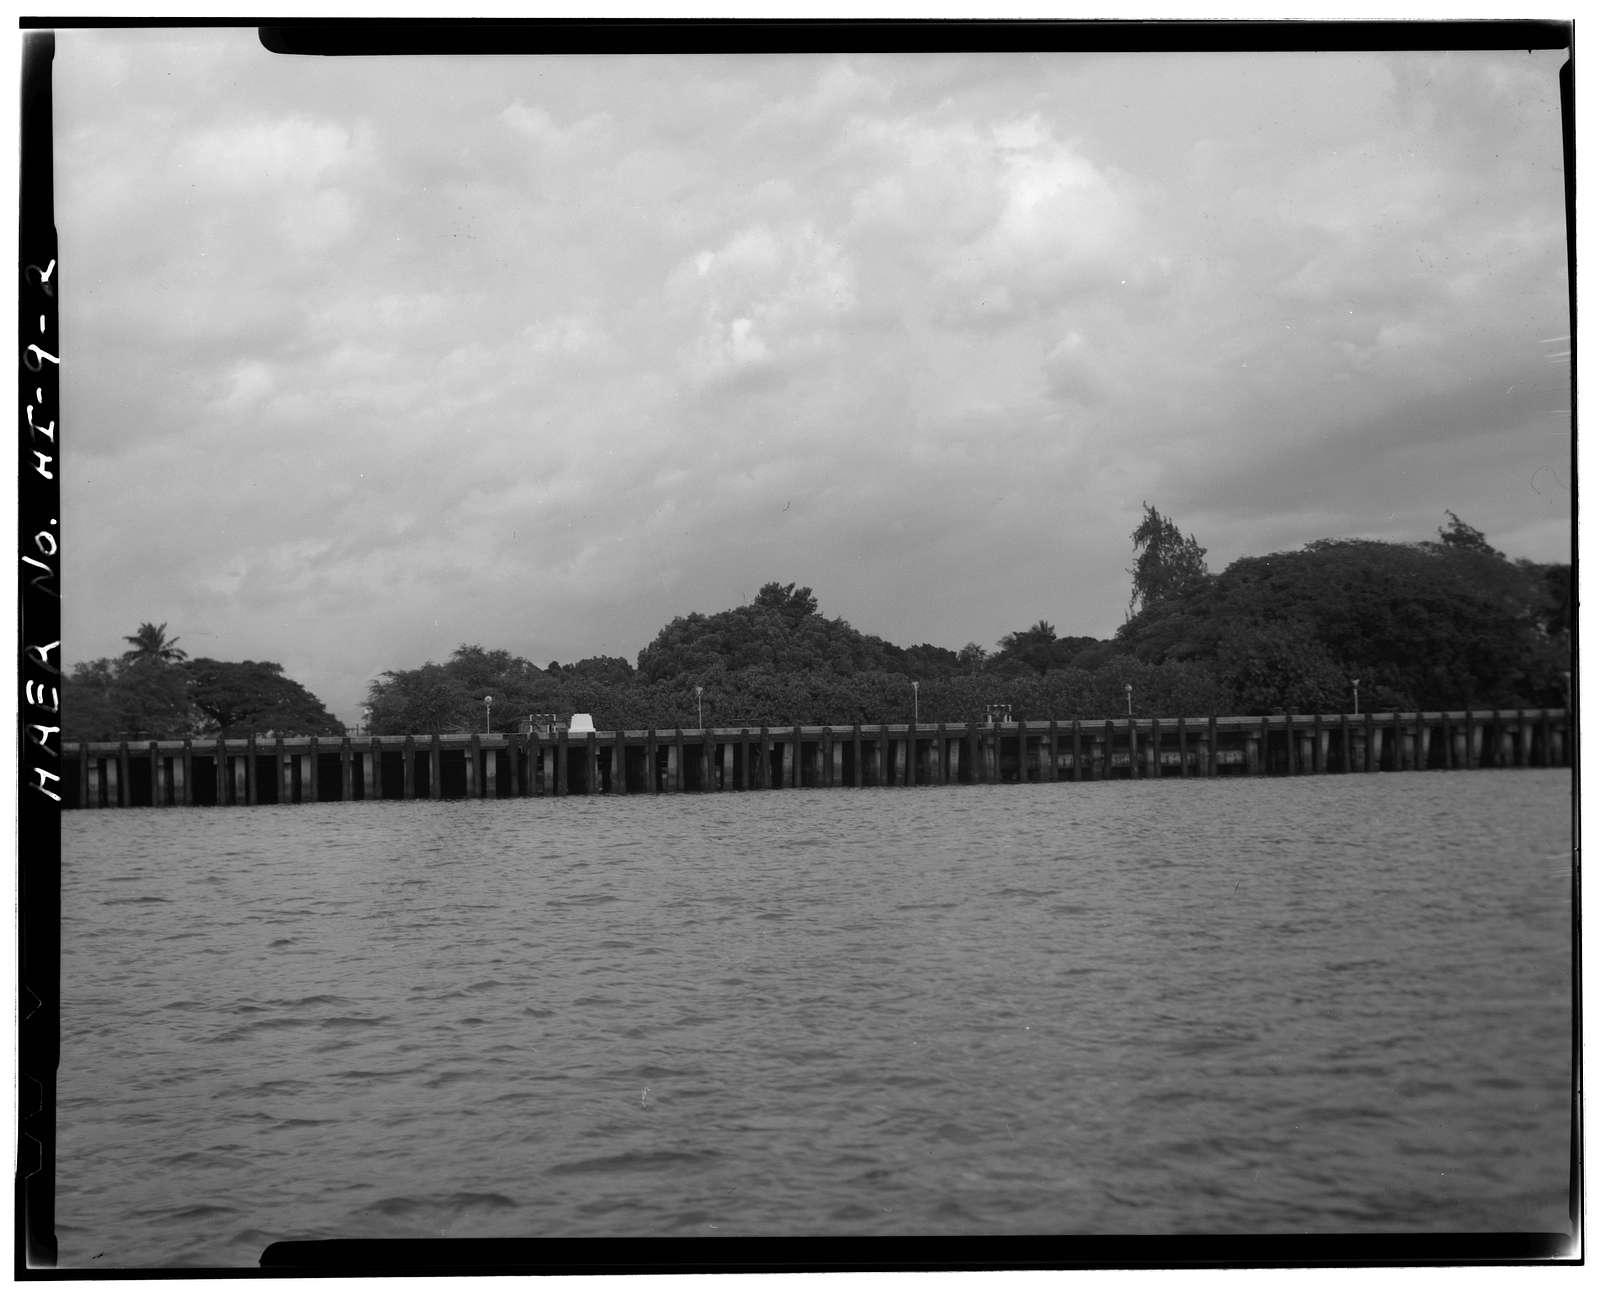 U.S. Naval Base, Pearl Harbor, Berthing Wharf S378, Beckoning Point, Southeast of Cowpens Street, Ford Island, Pearl City, Honolulu County, HI